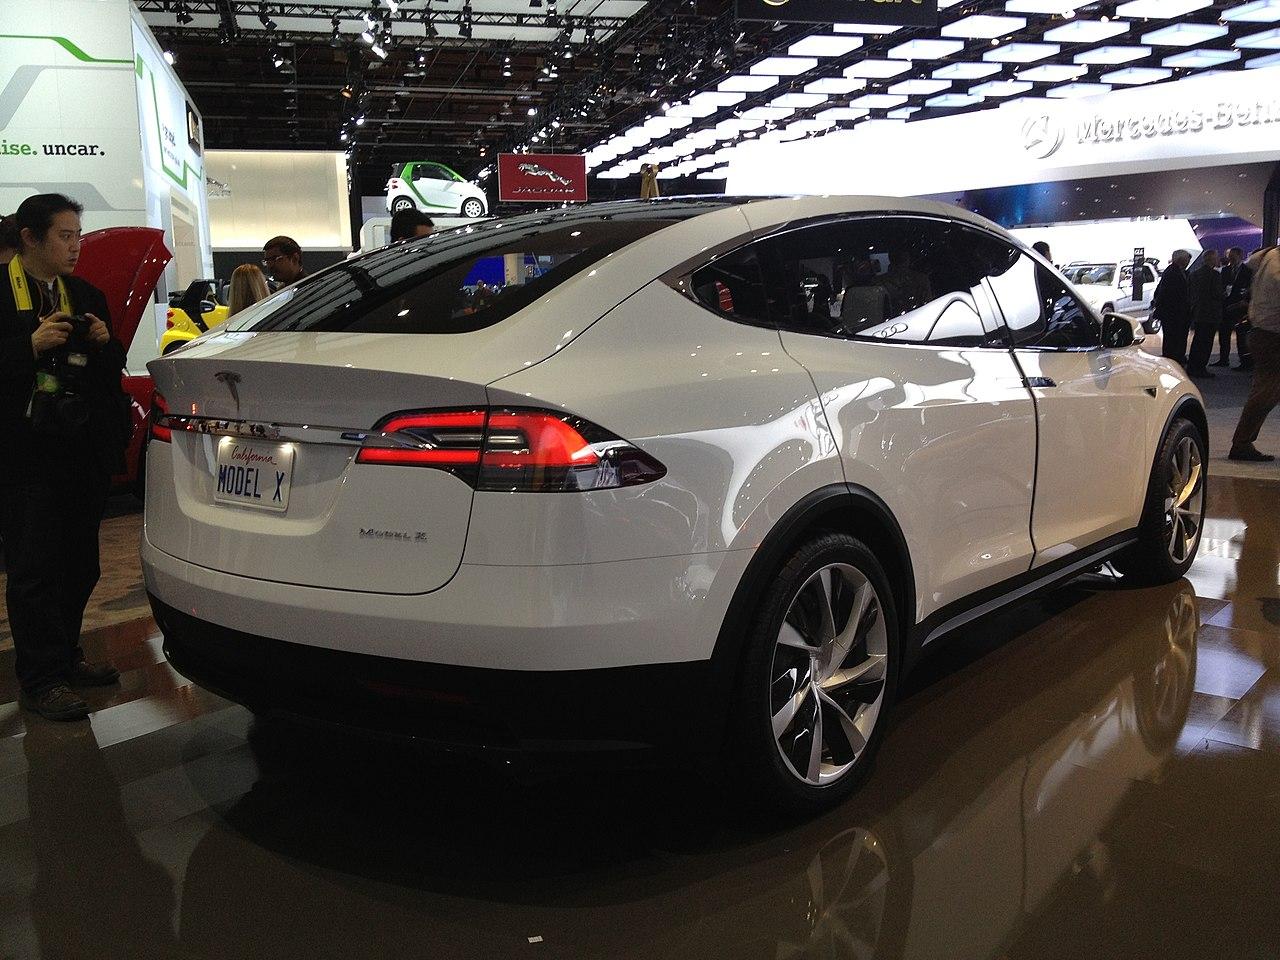 Tesla Model Y Wikipedia: Original File  (3,264 × 2,448 Pixels, File Size: 3.9 MB